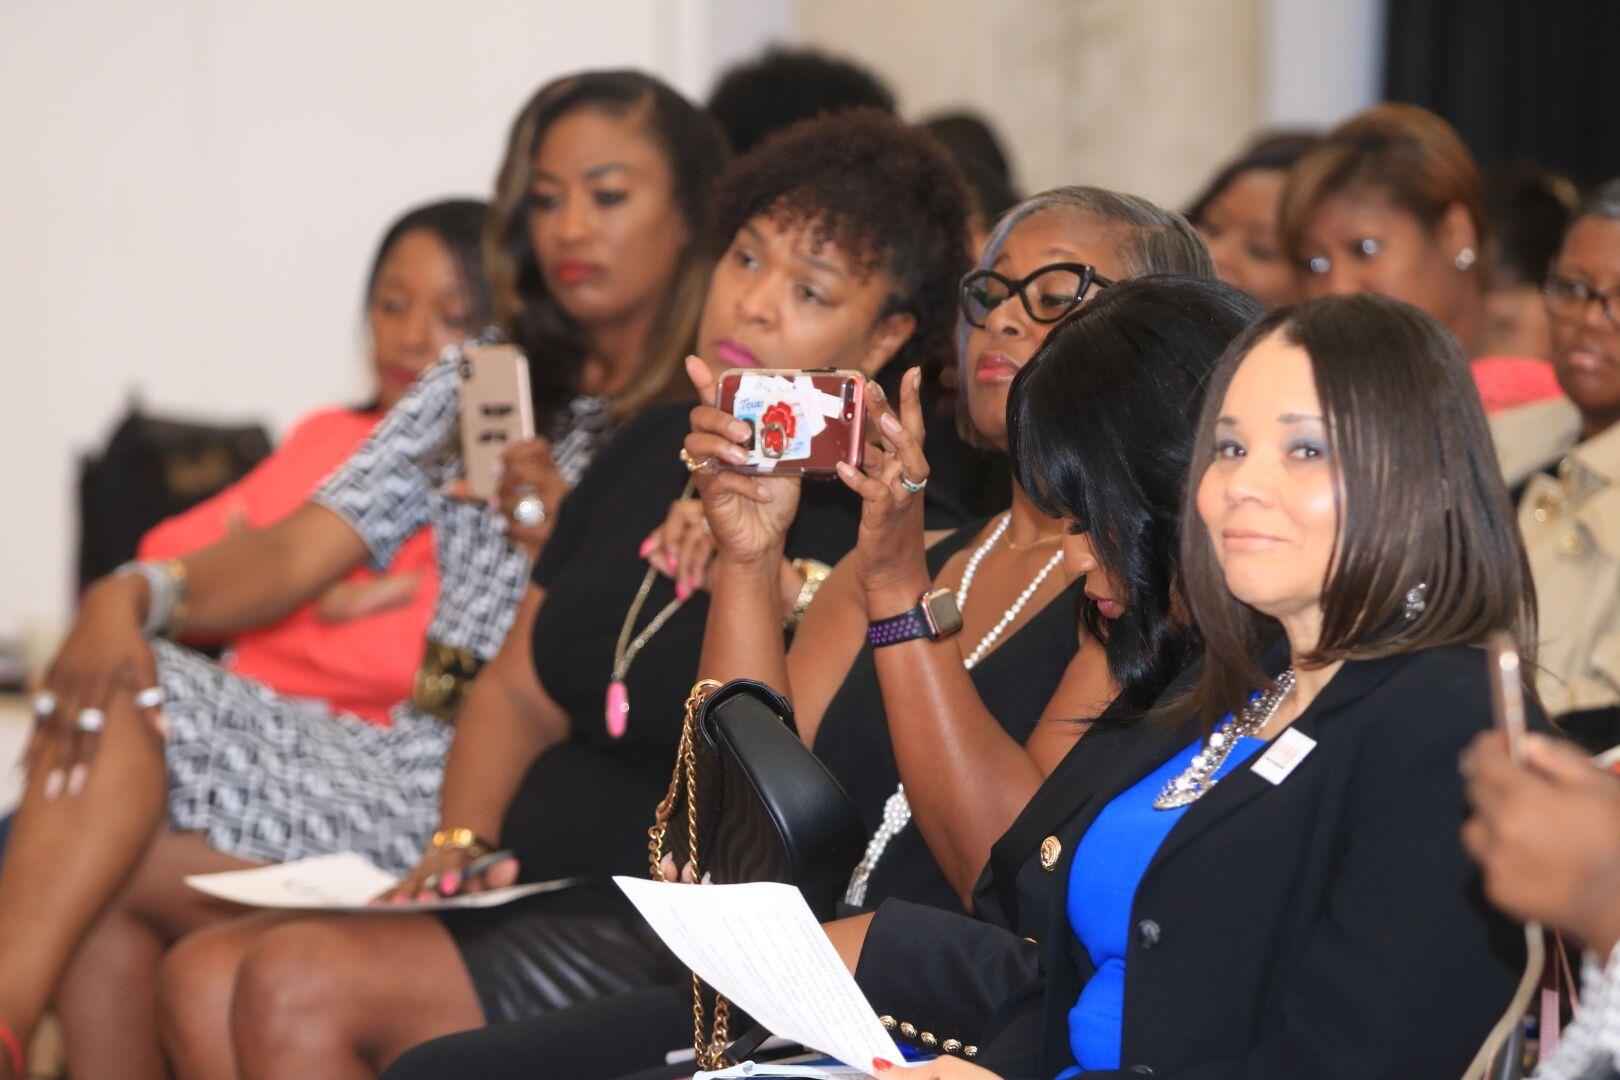 Ladies at Event.jpeg